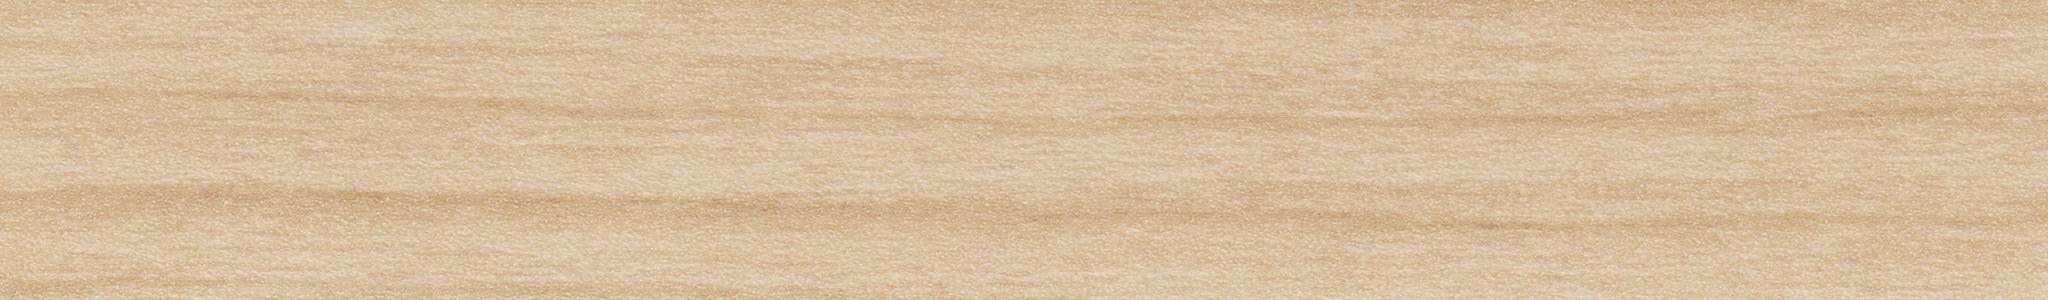 HD 227740 ABS Kante Dekor Kirsche Cremona perl